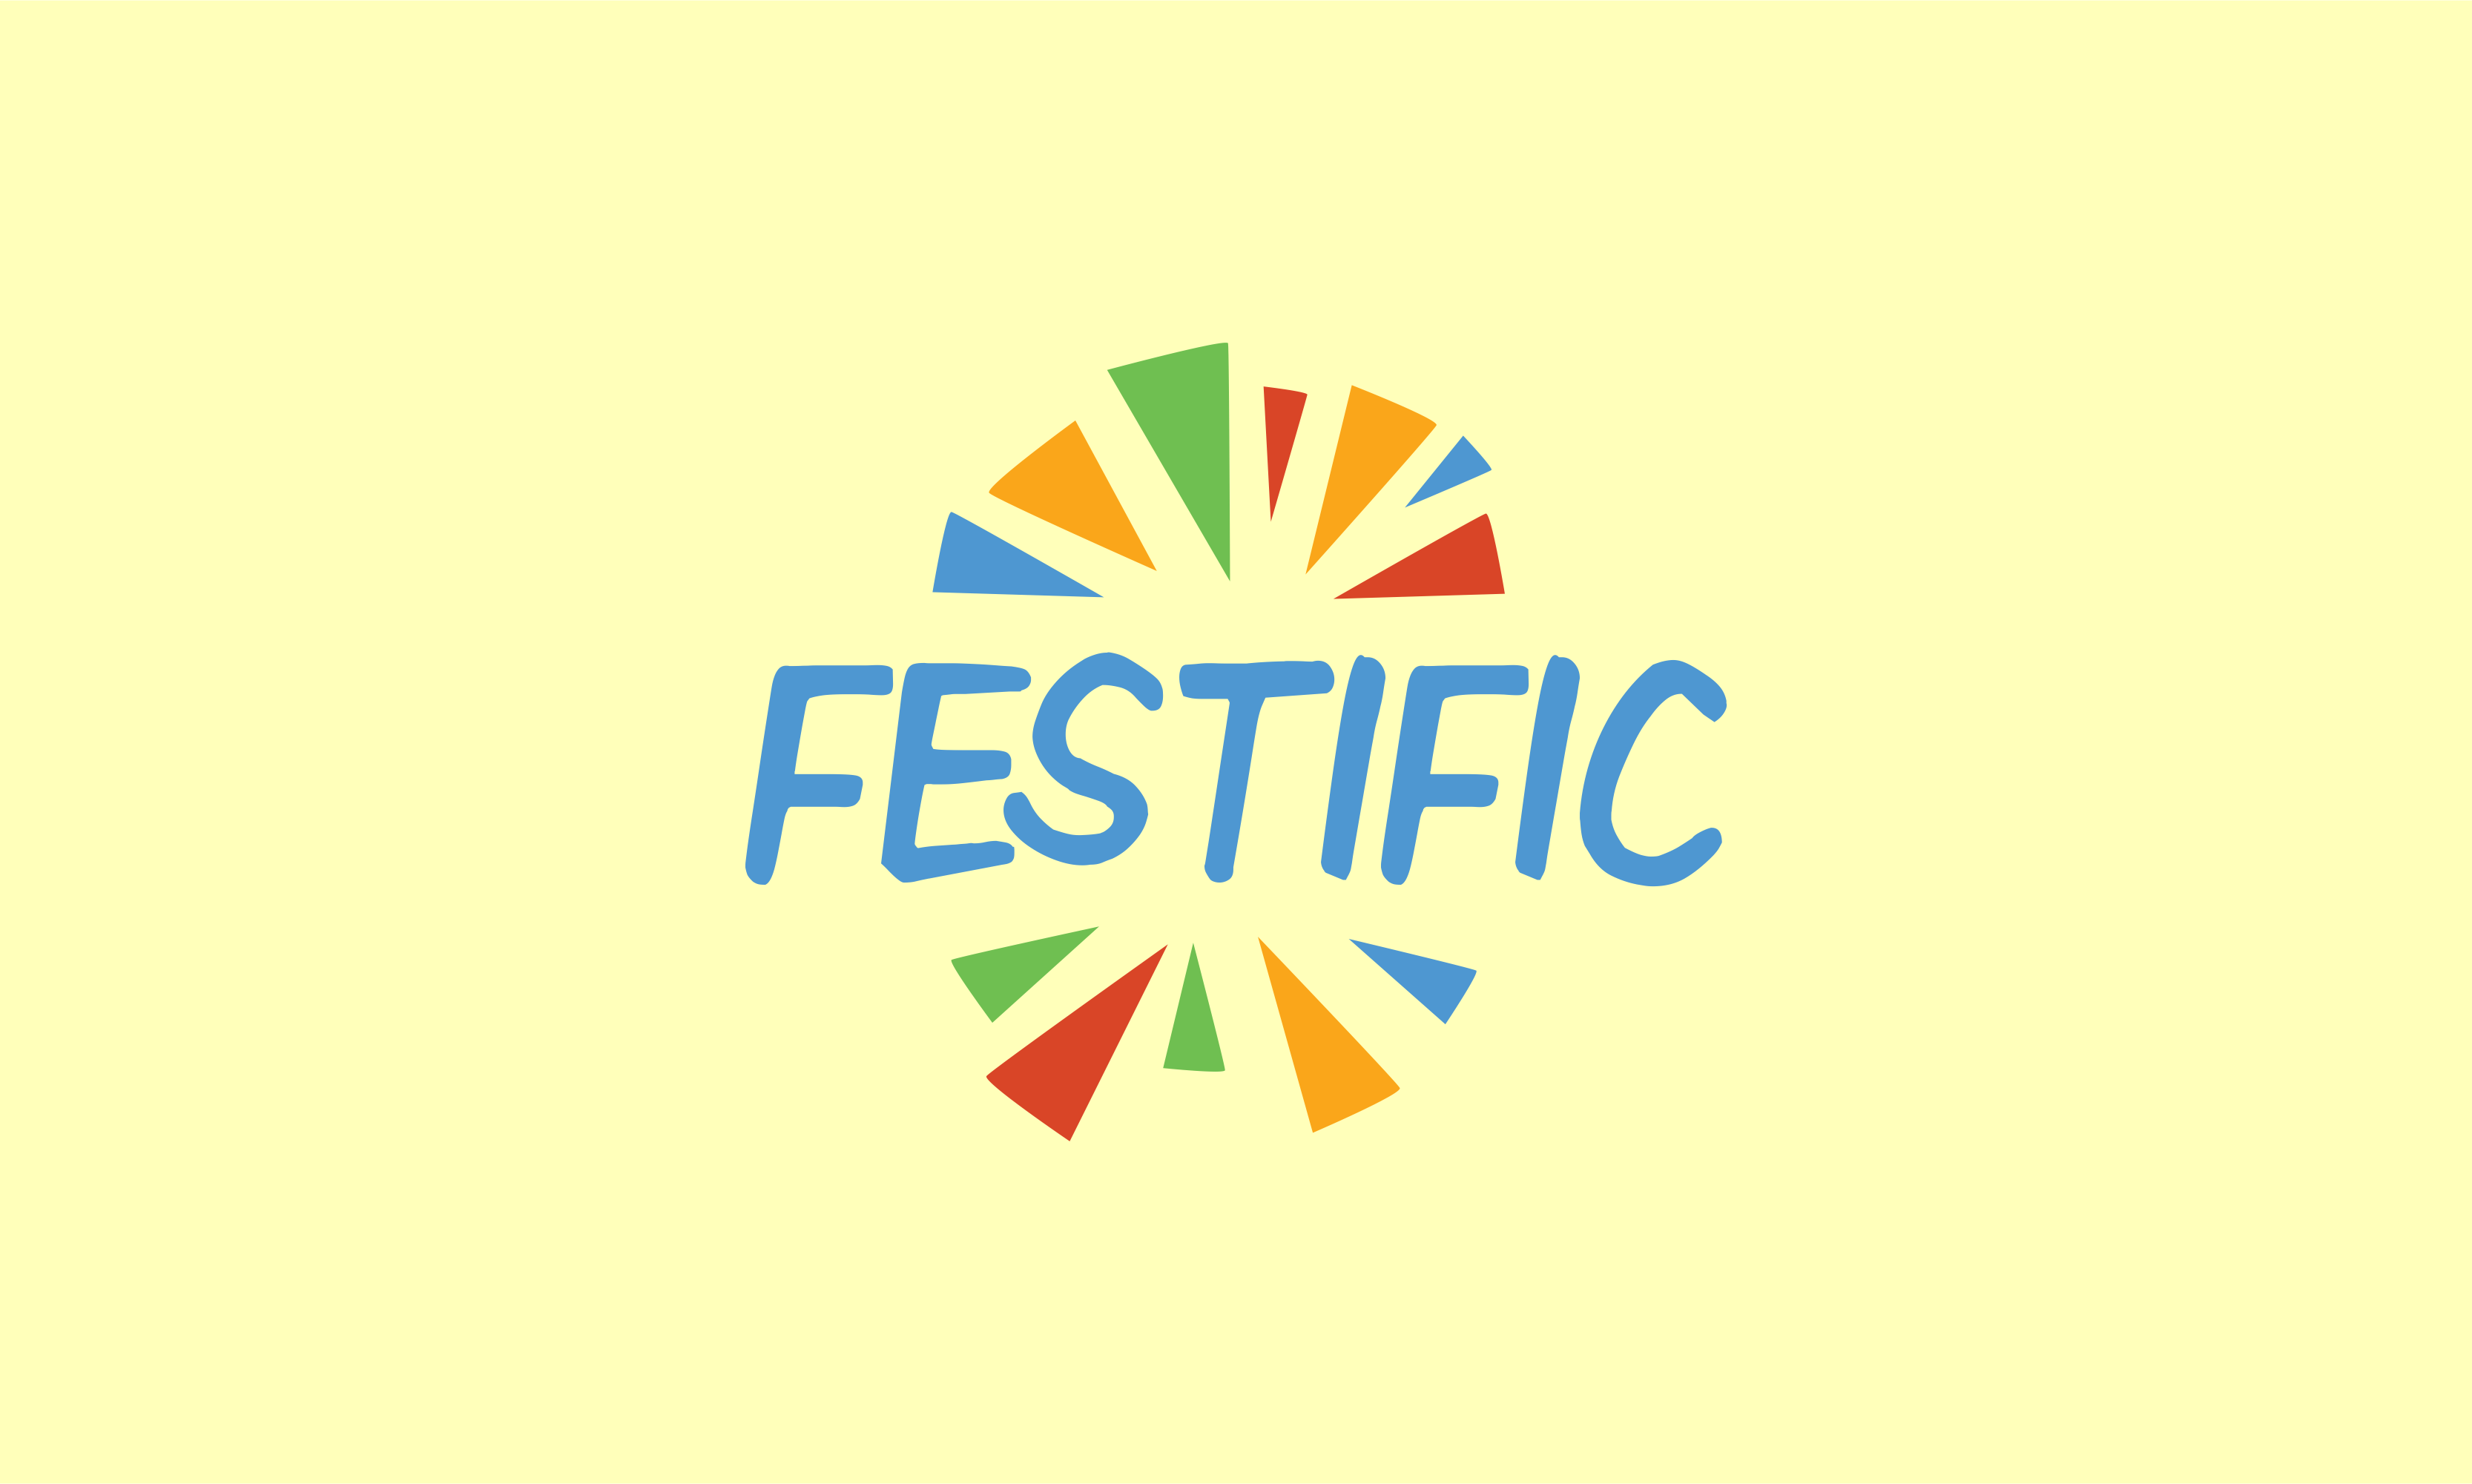 festific logo